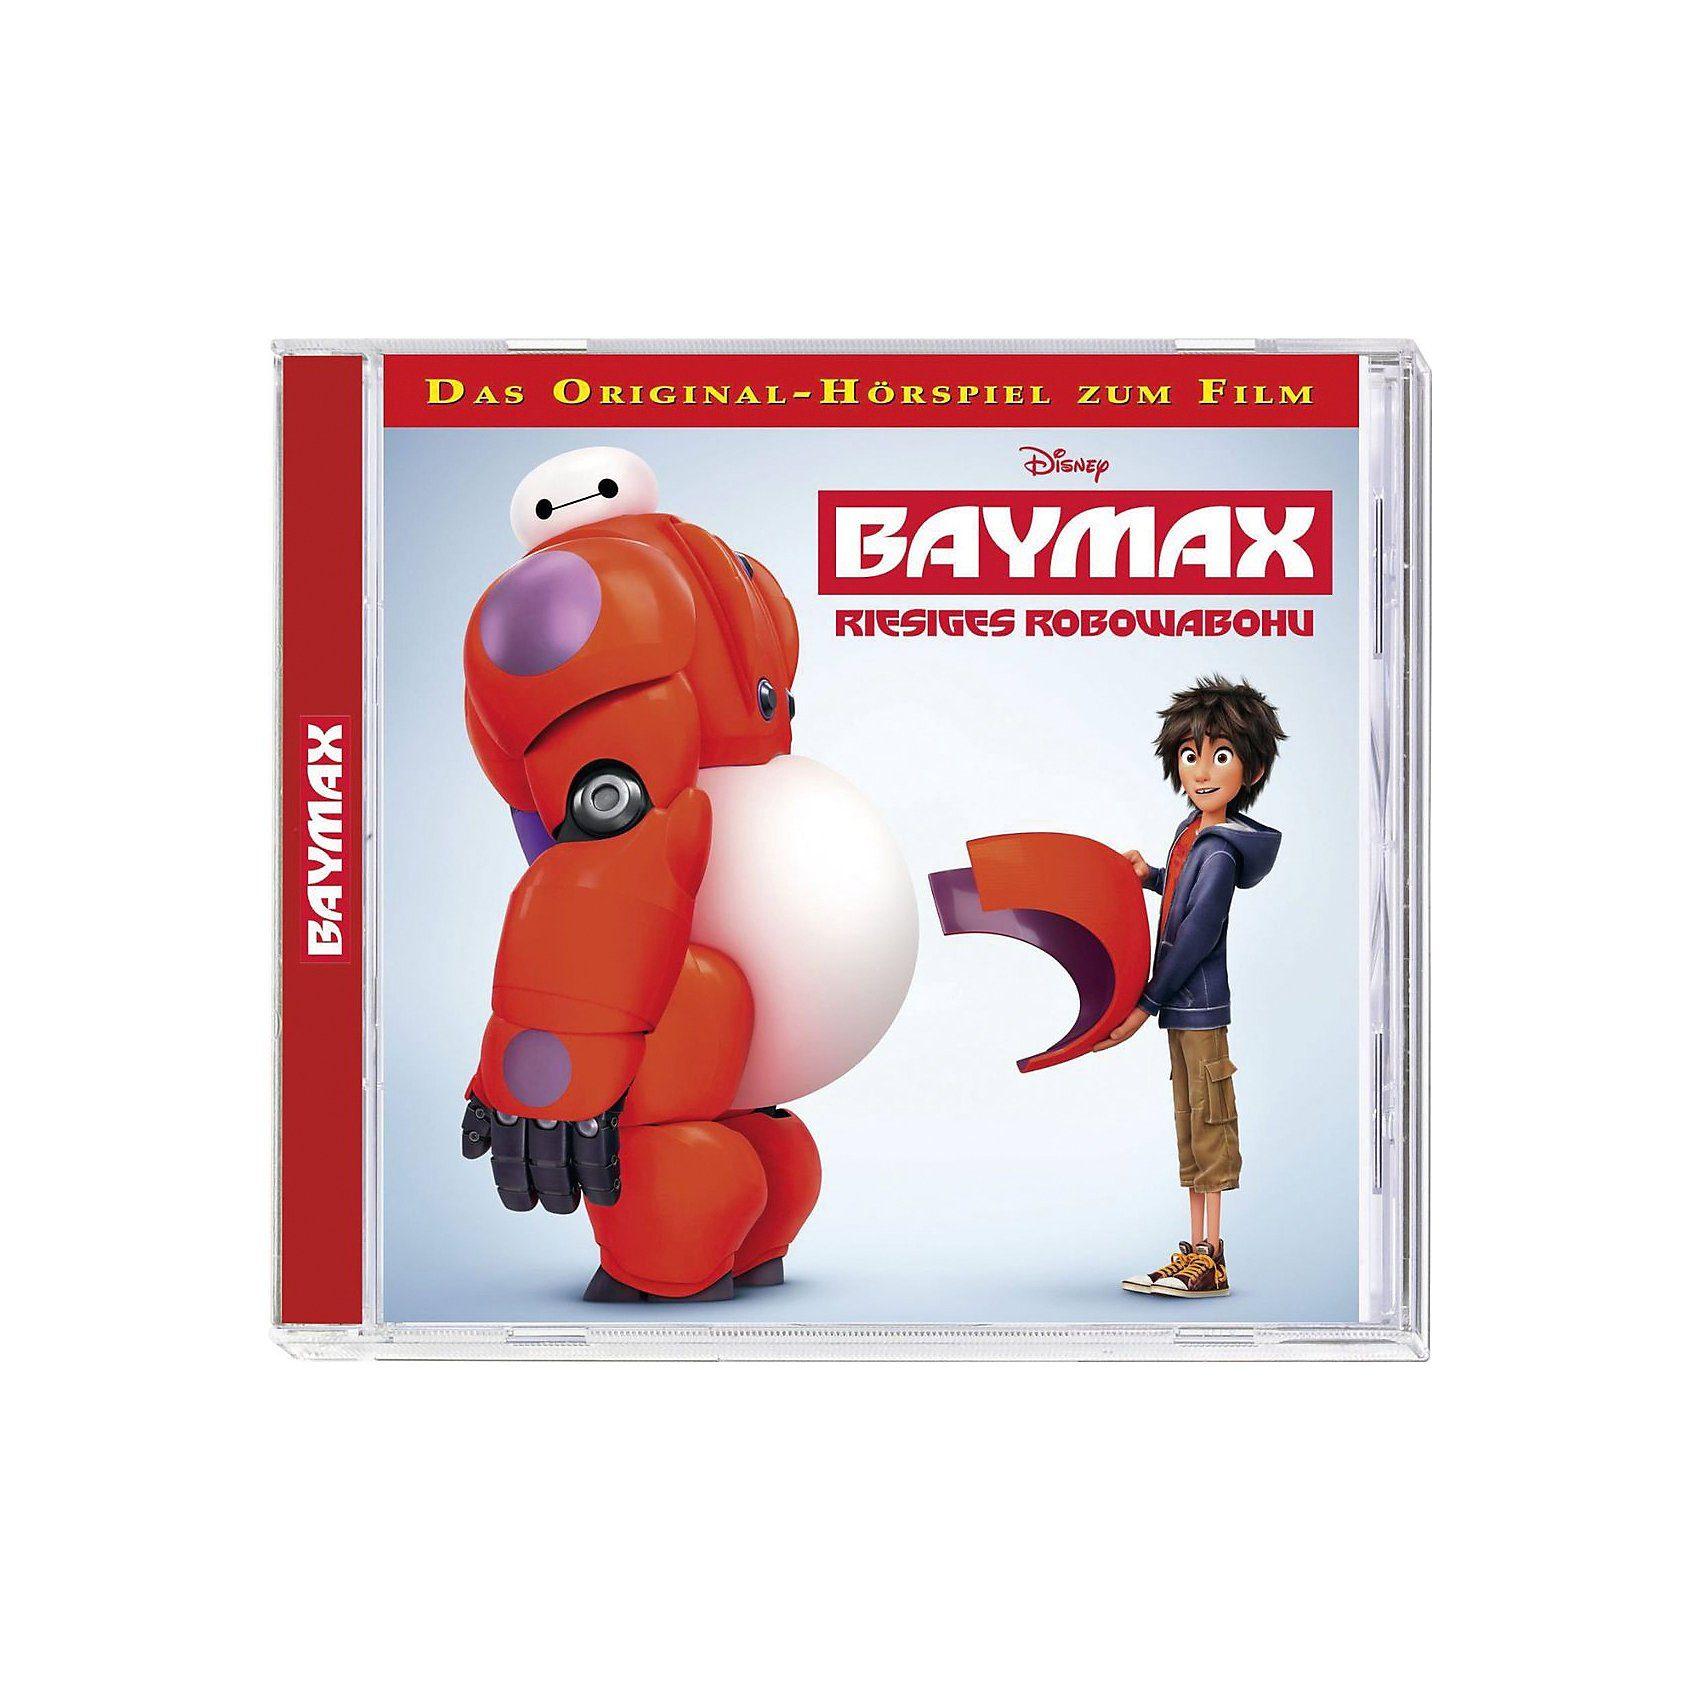 Kiddinx CD Disney Baymax - Riesiges Robowabohu (Hörspiel zum Film)